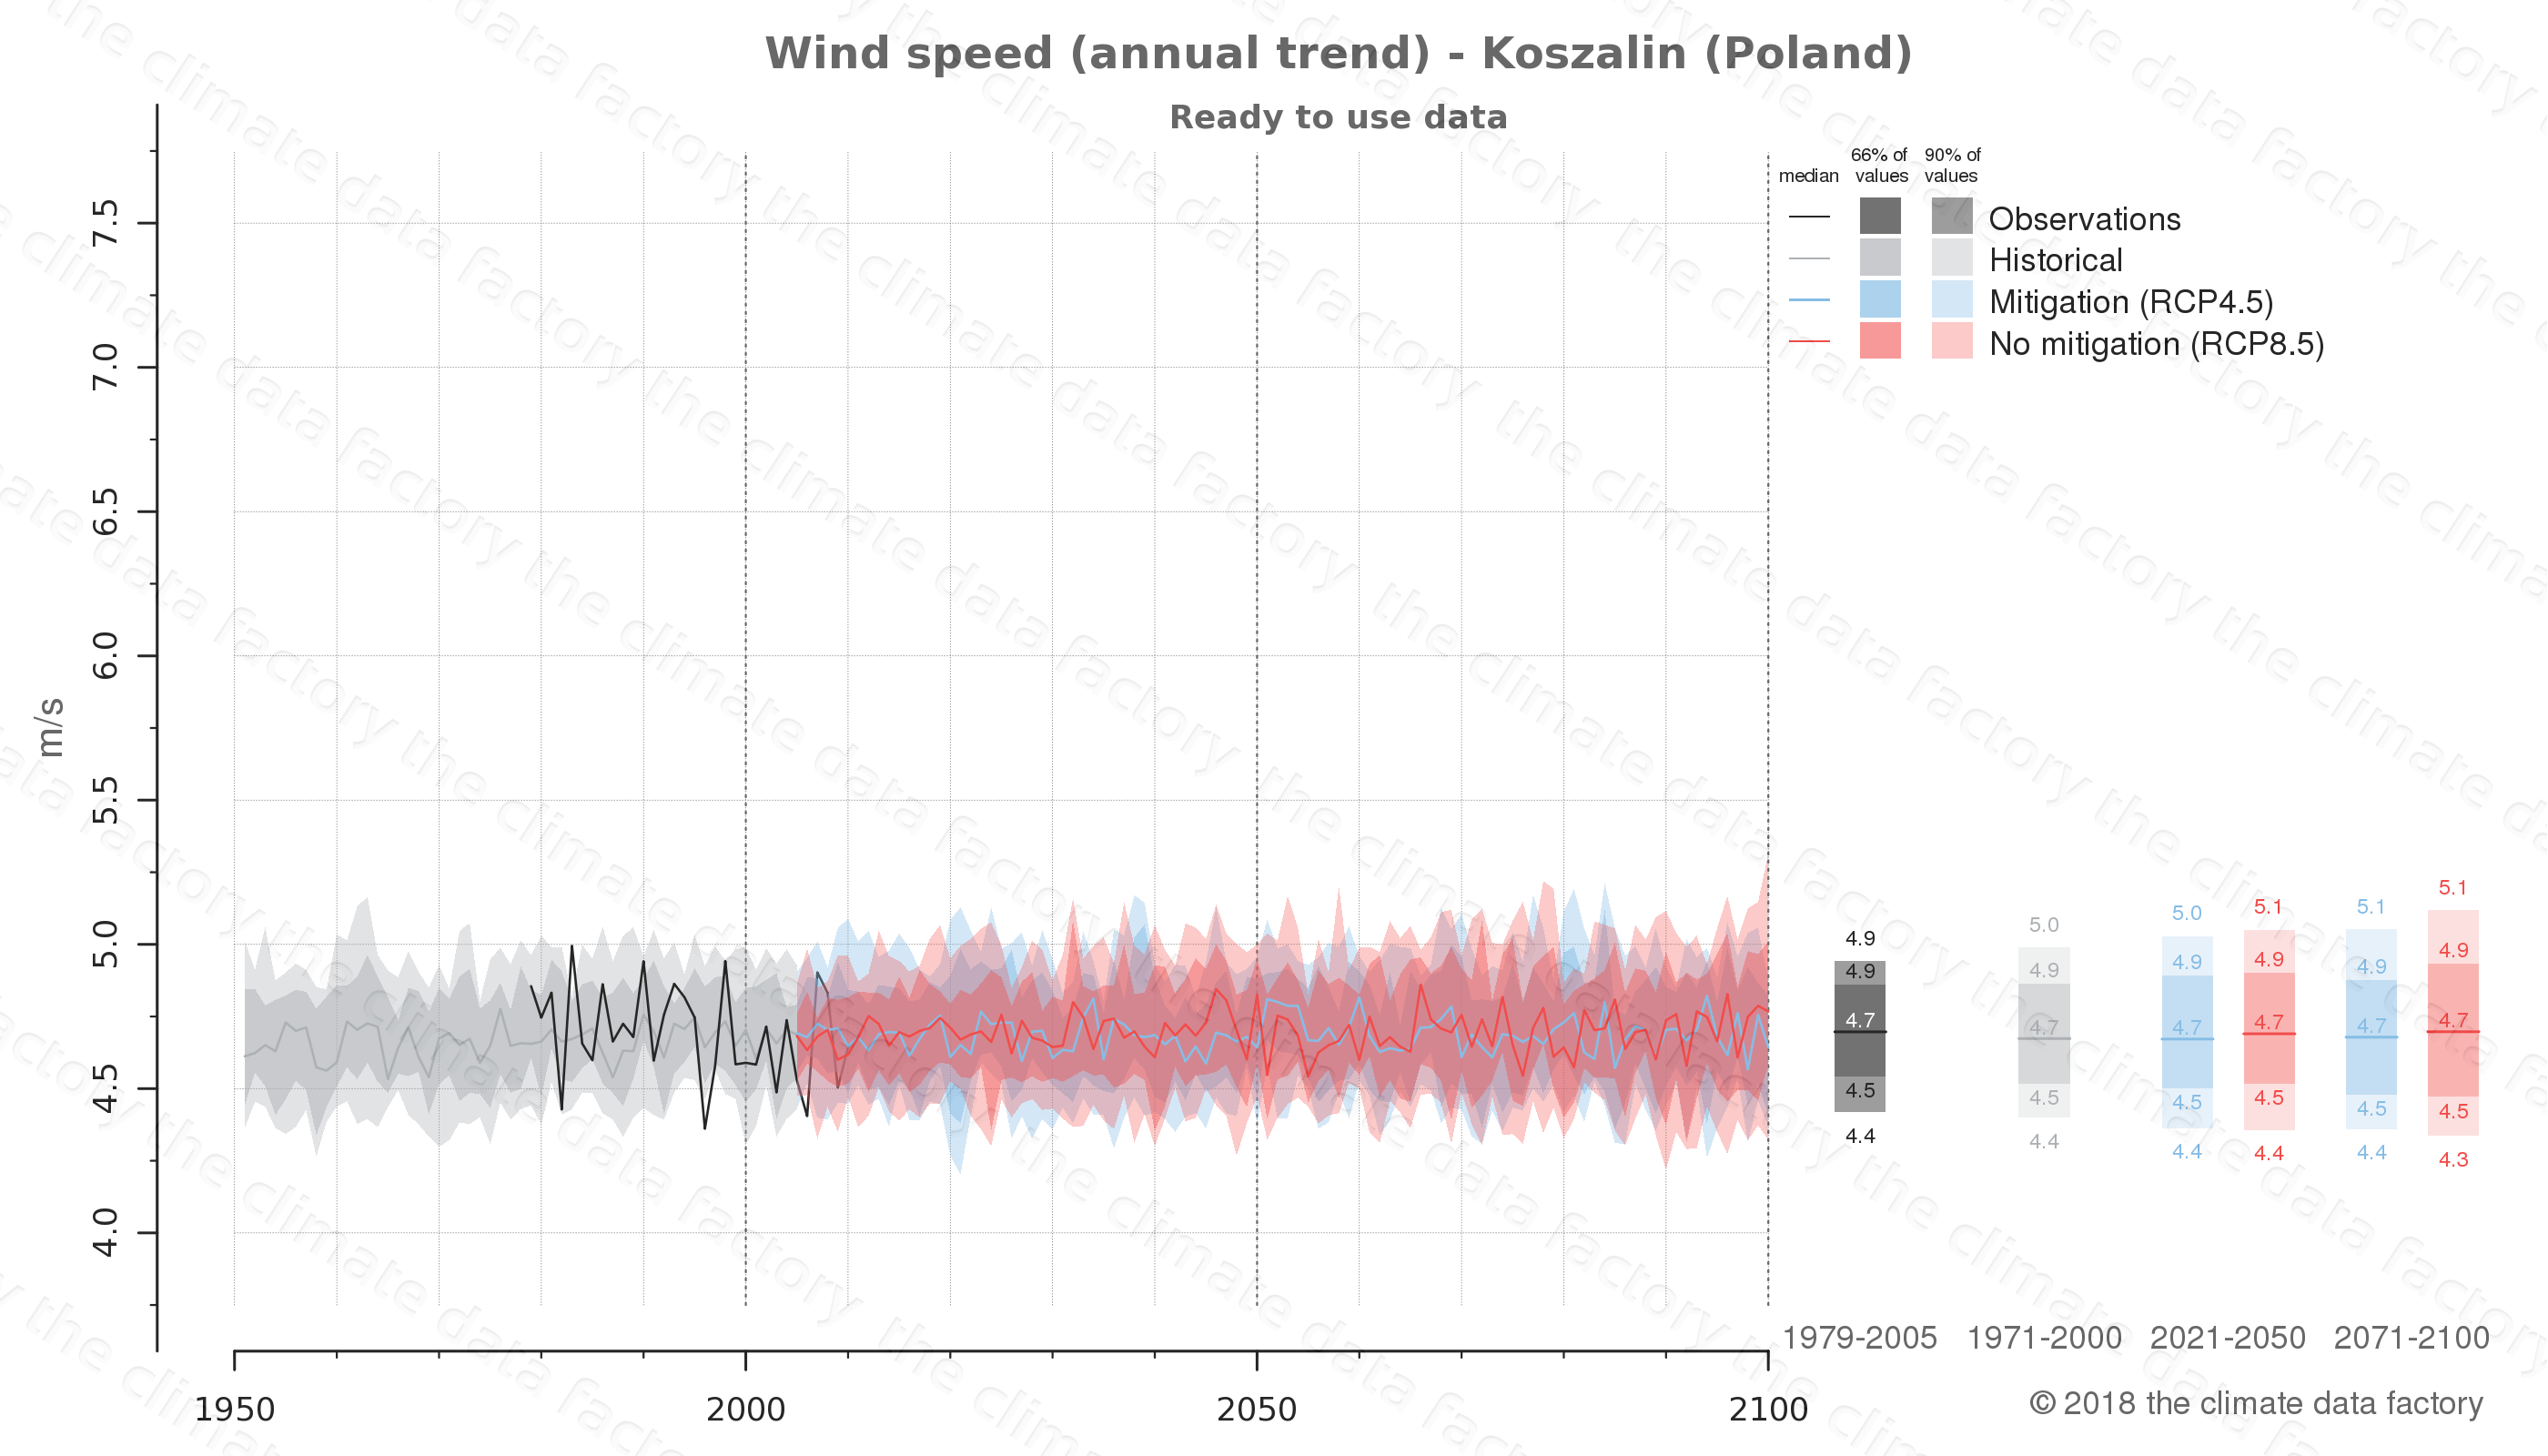 climate change data policy adaptation climate graph city data wind-speed koszalin poland